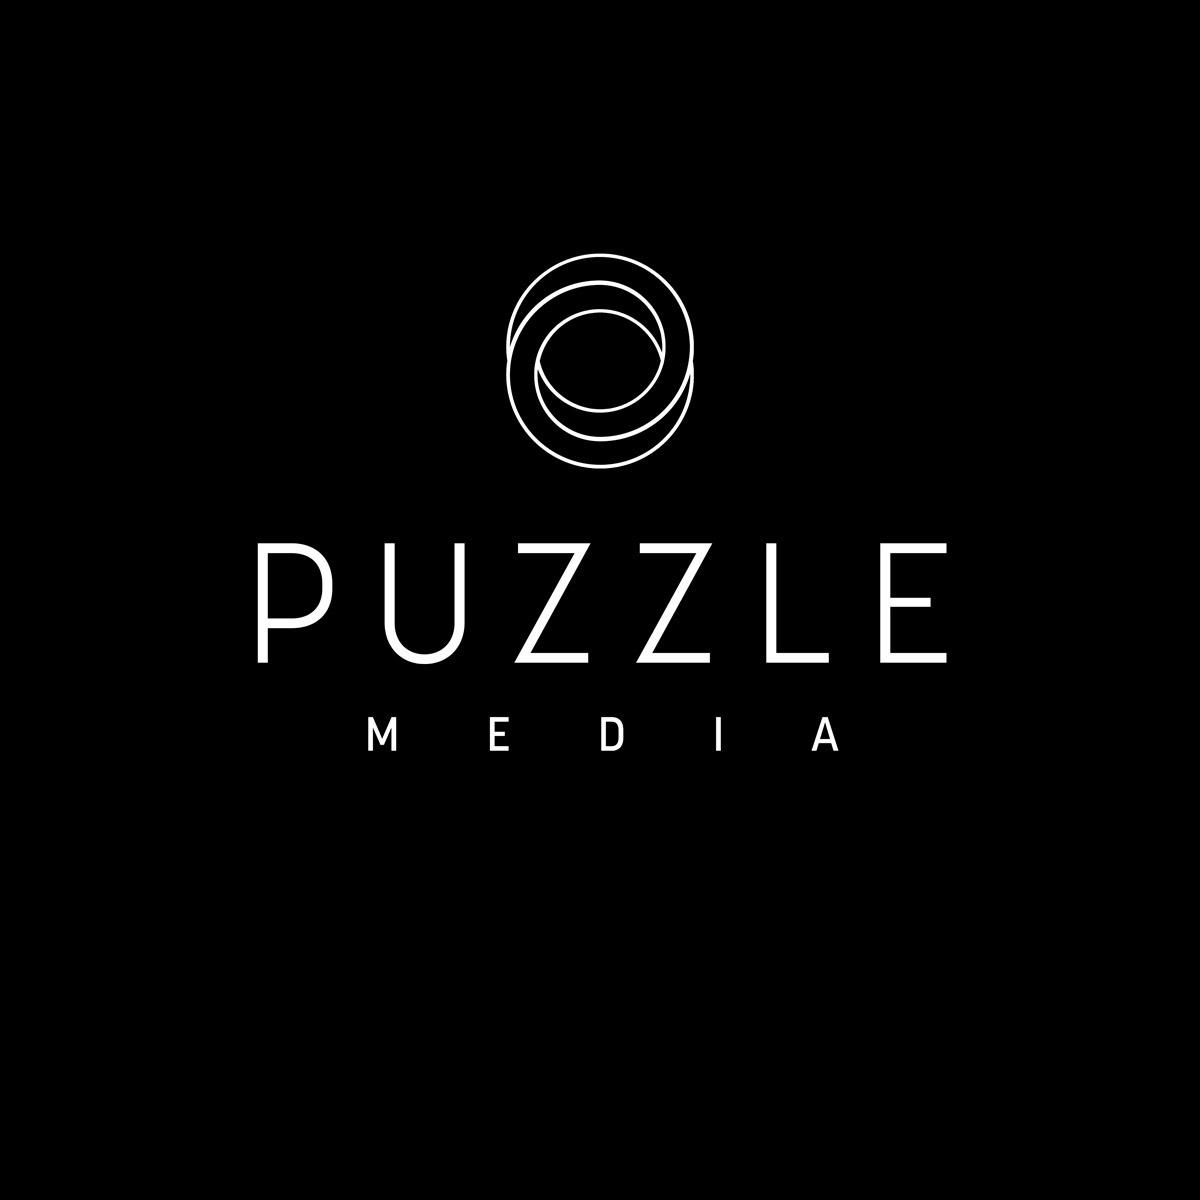 Puzzle-Media-Variation